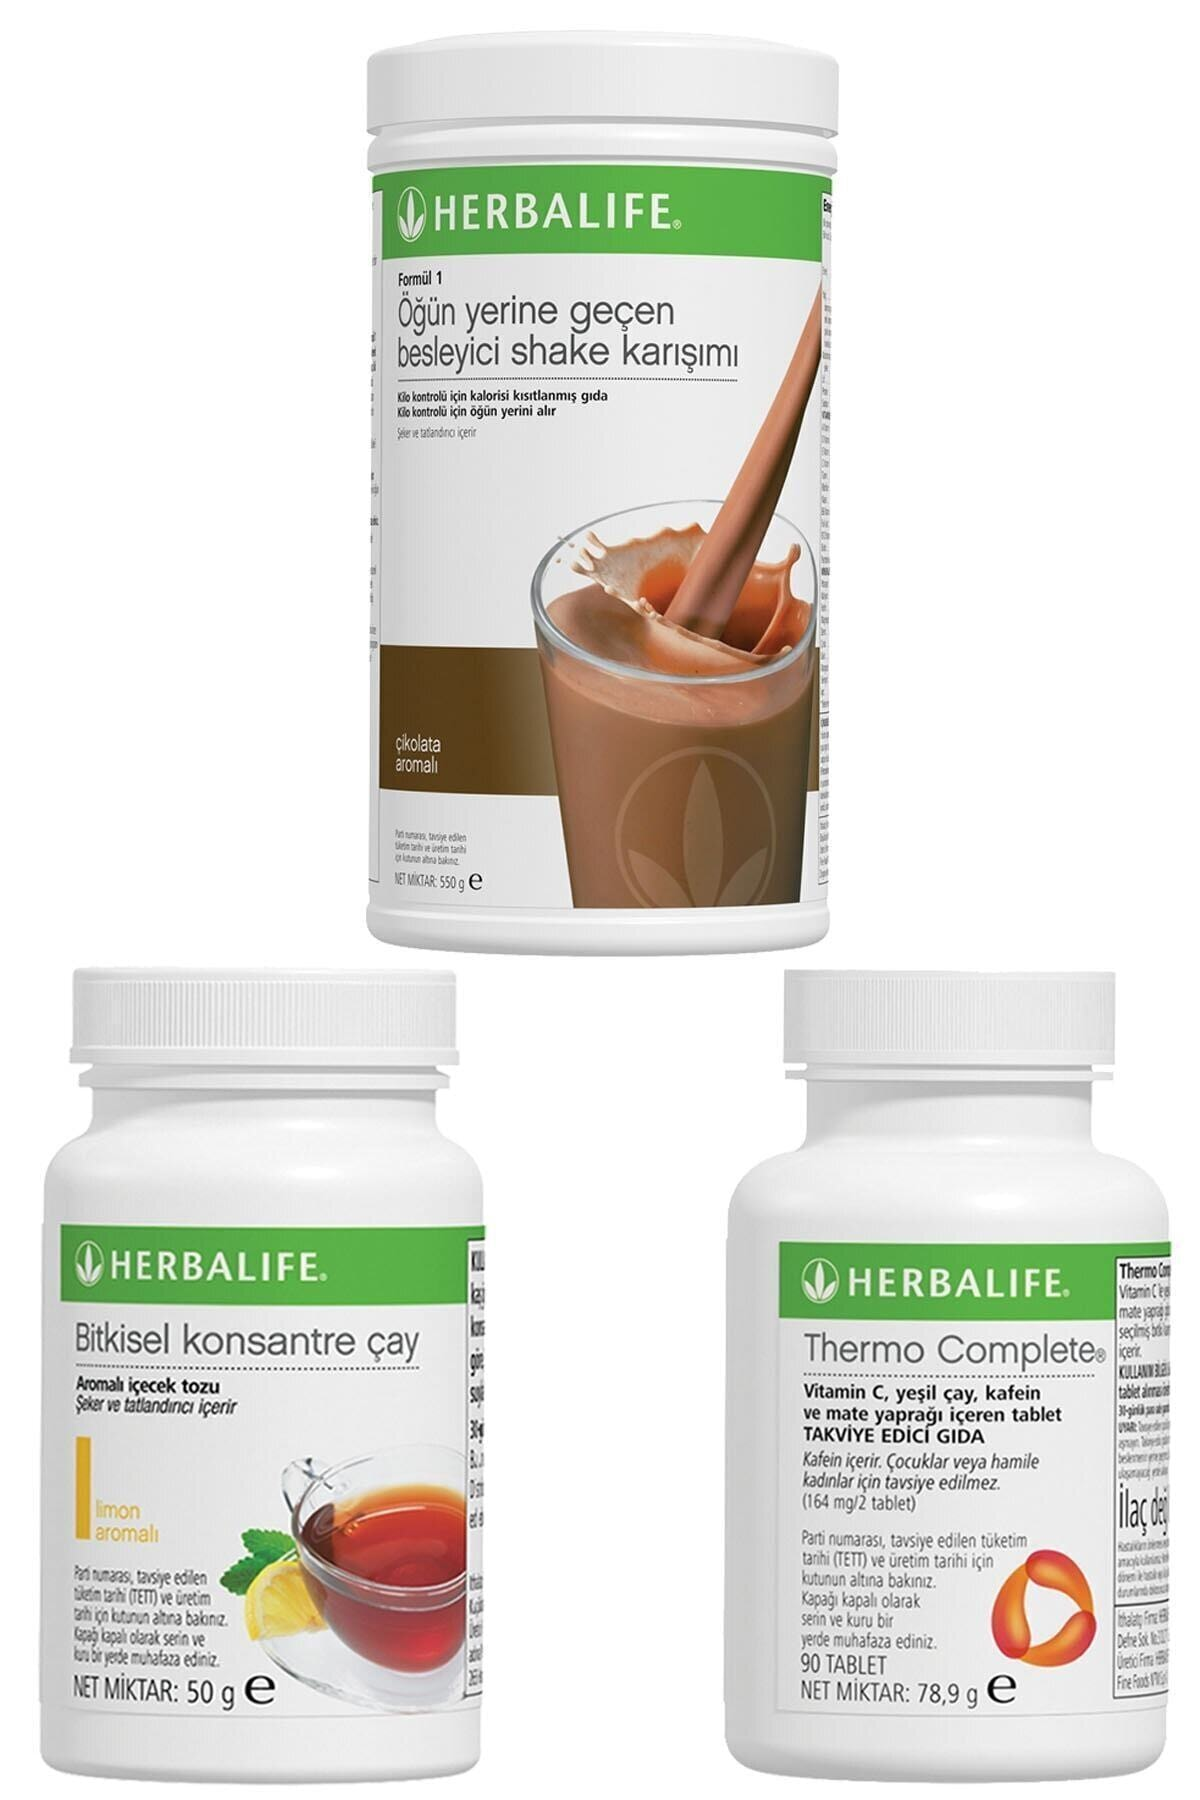 Herbalife Shake Çikolatalı, Thermo Complete, Limonlu Çay 50gr Birer Adet 1